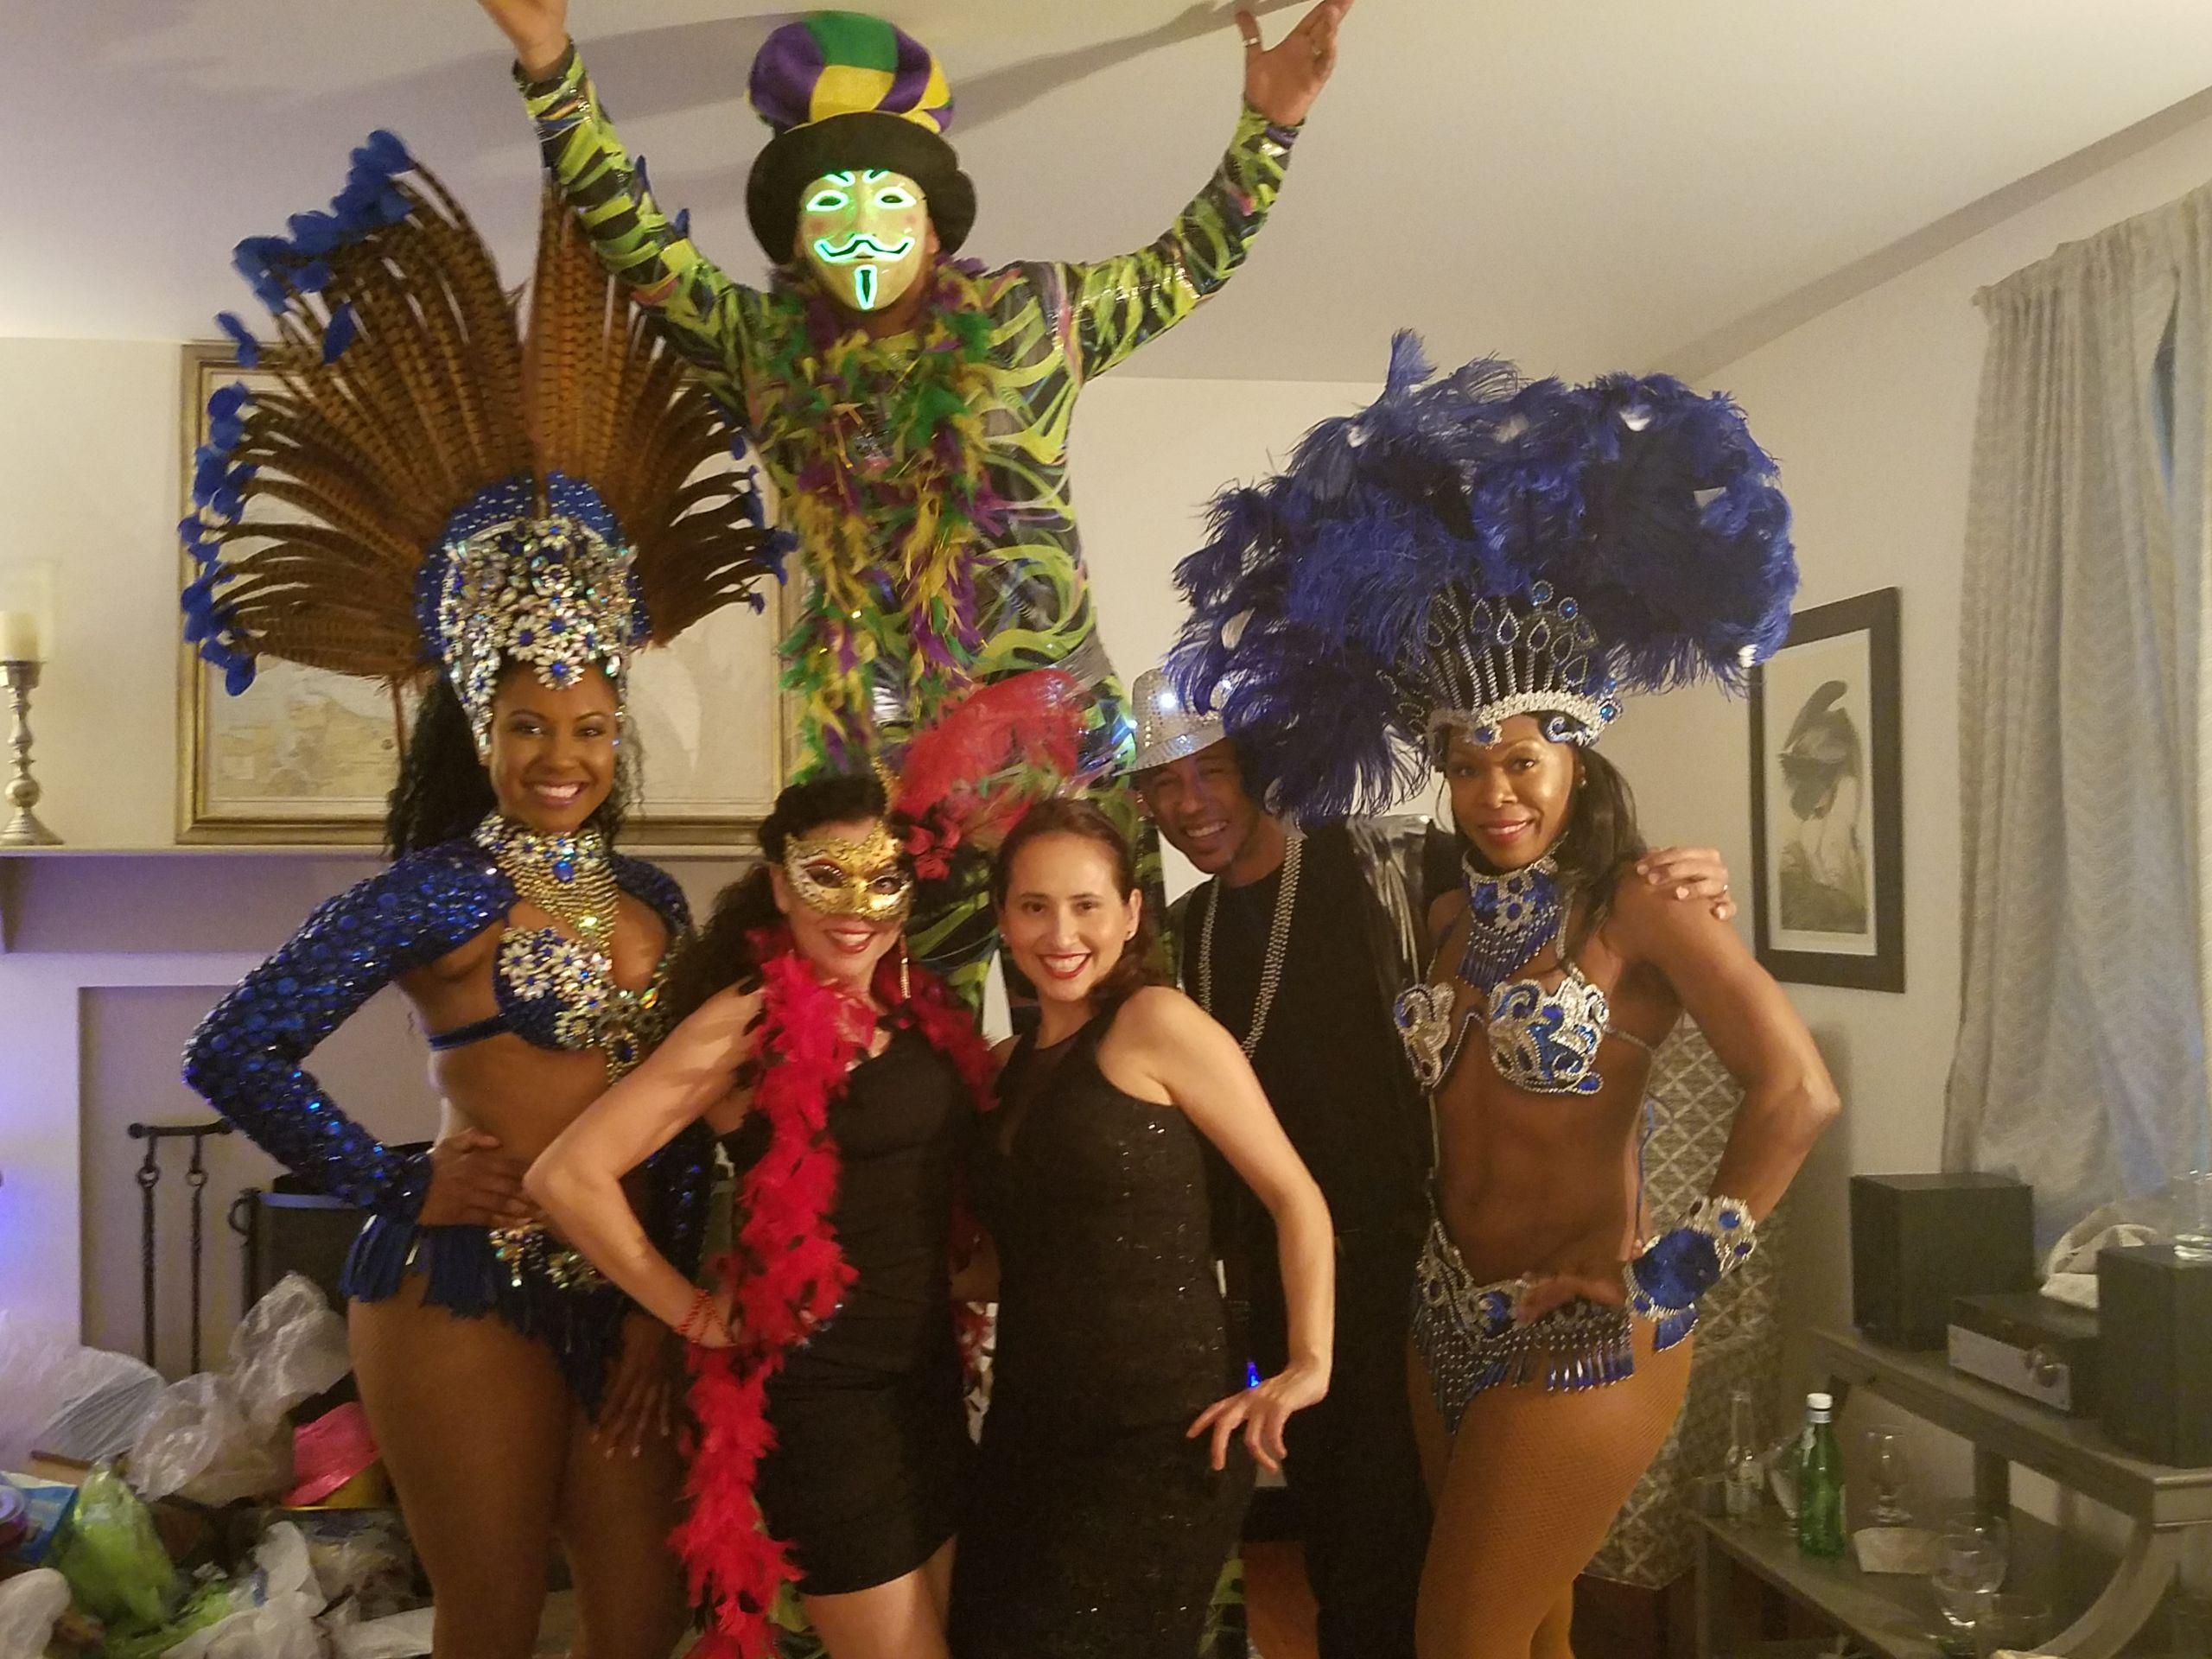 Stilt Walker & Entertainers